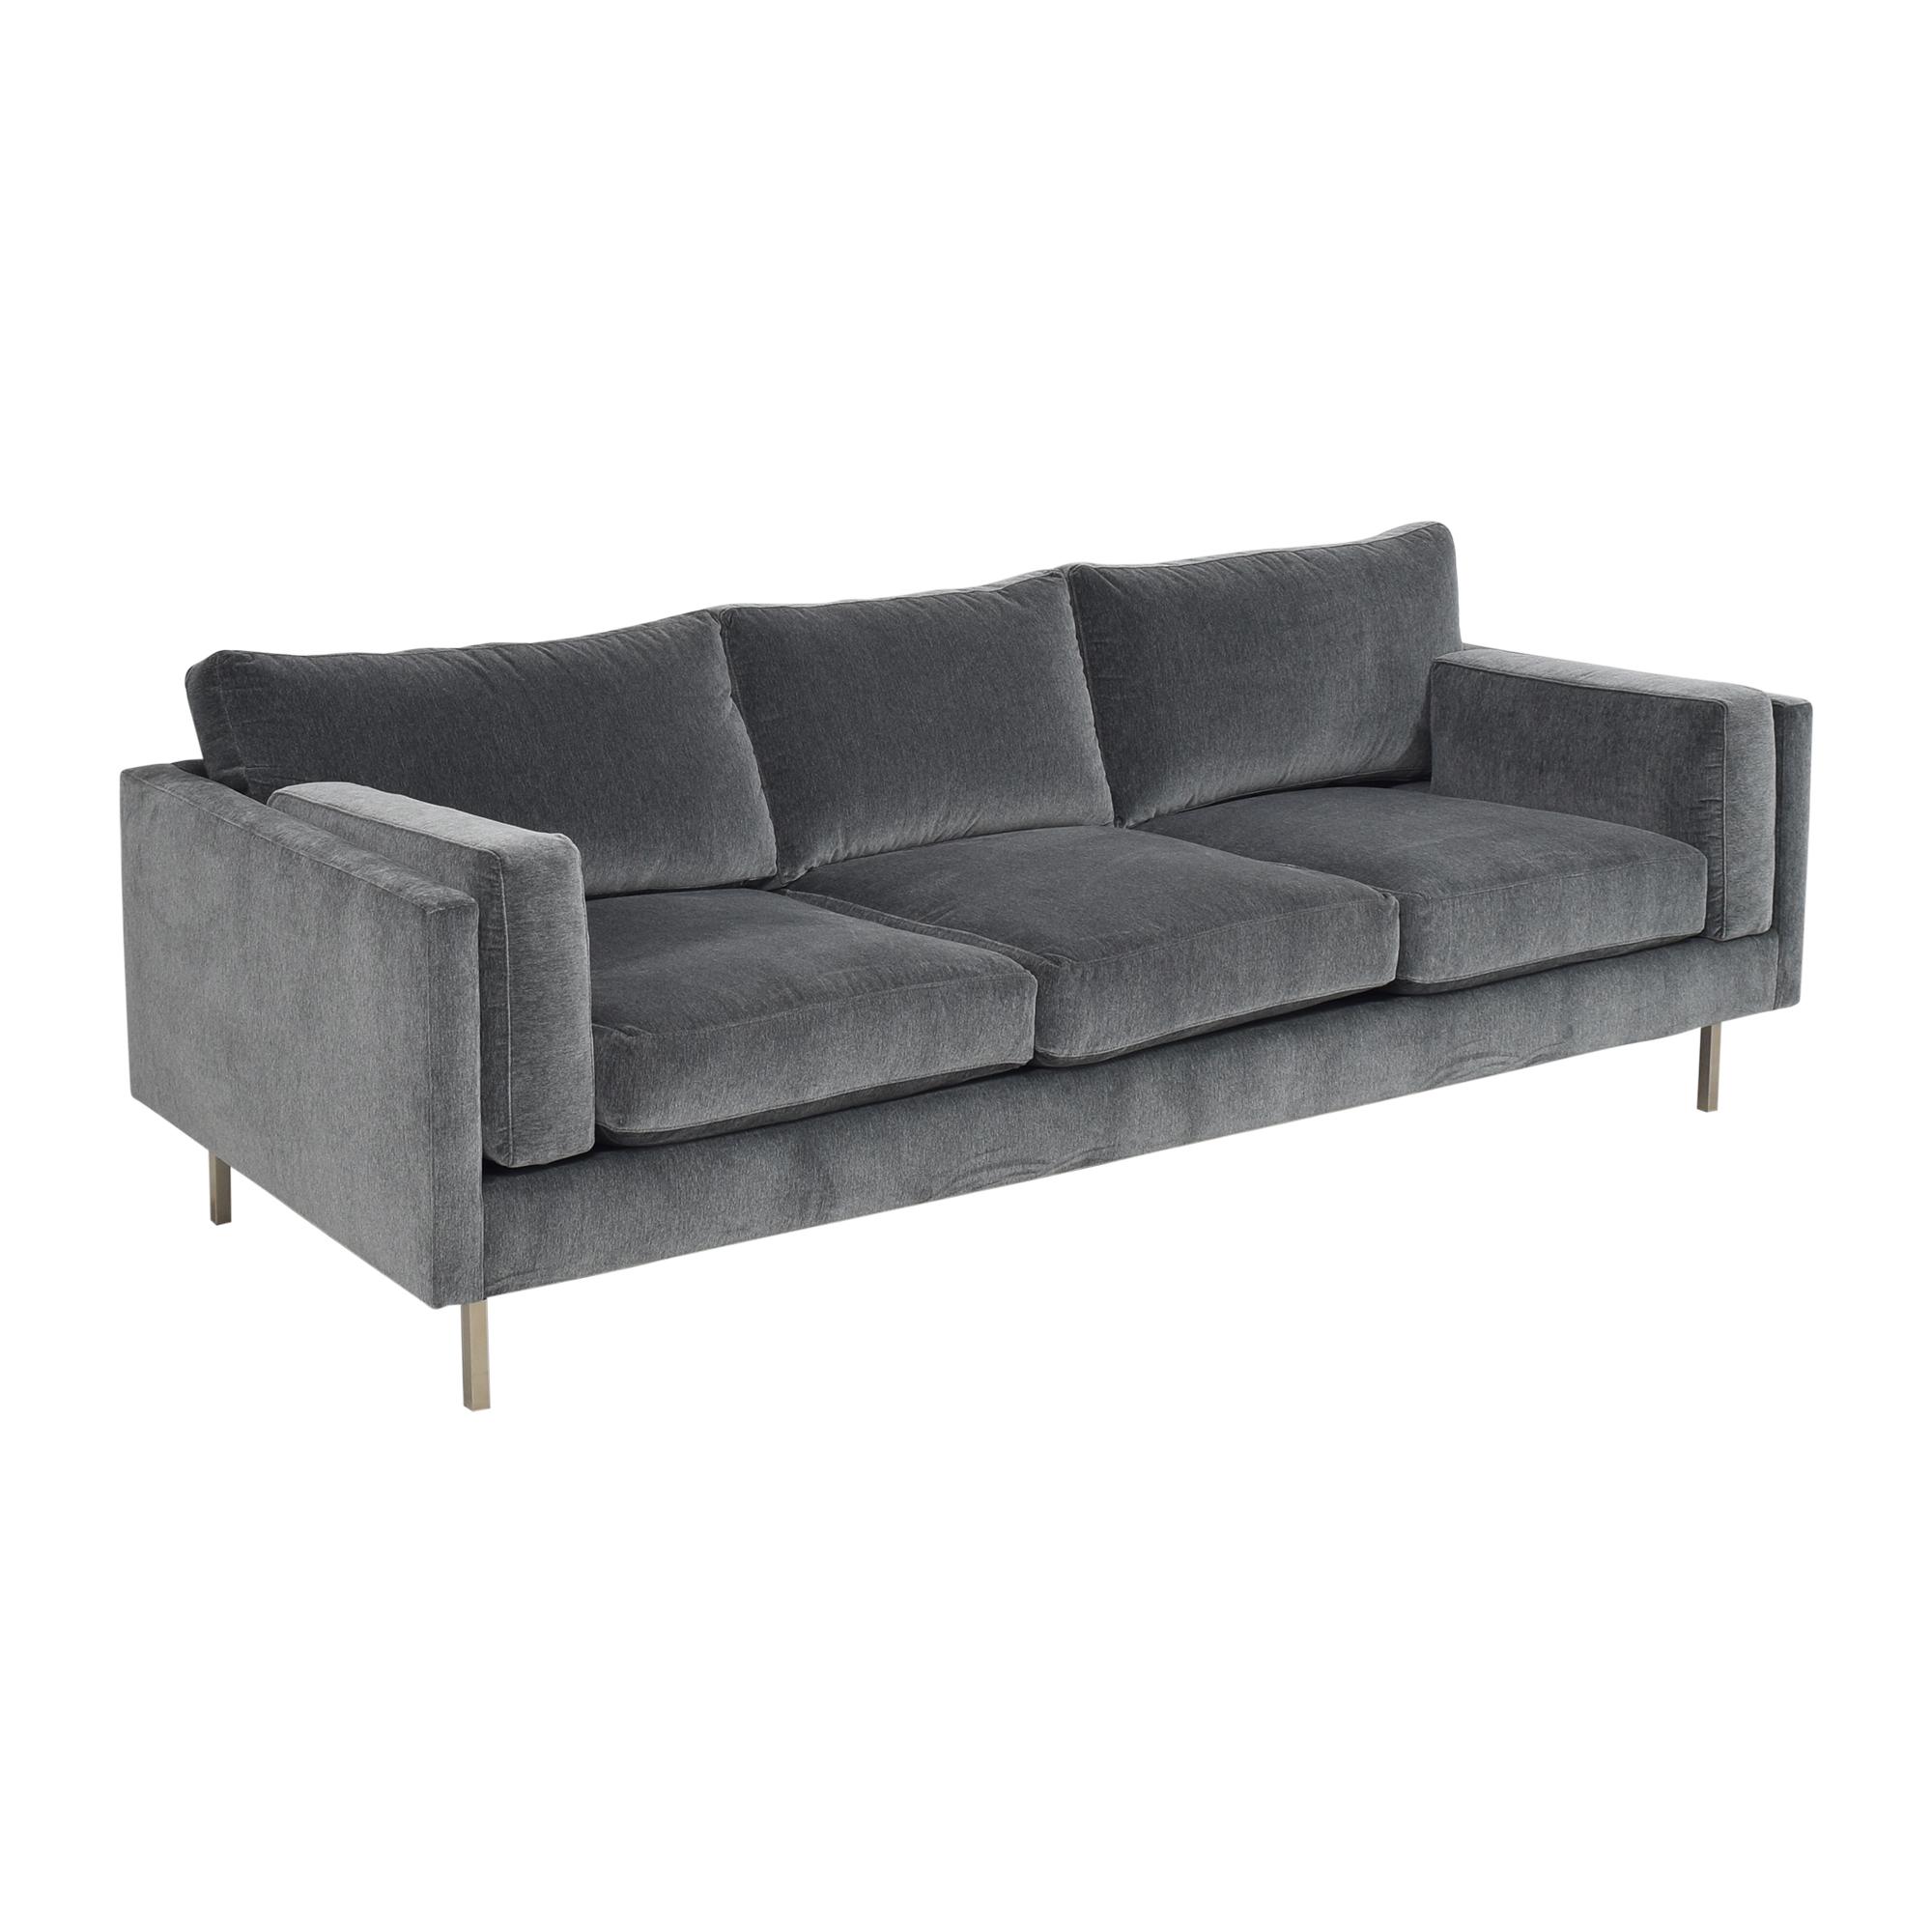 BenchMade Modern BenchMade Modern Skinny Fat Sofa for sale